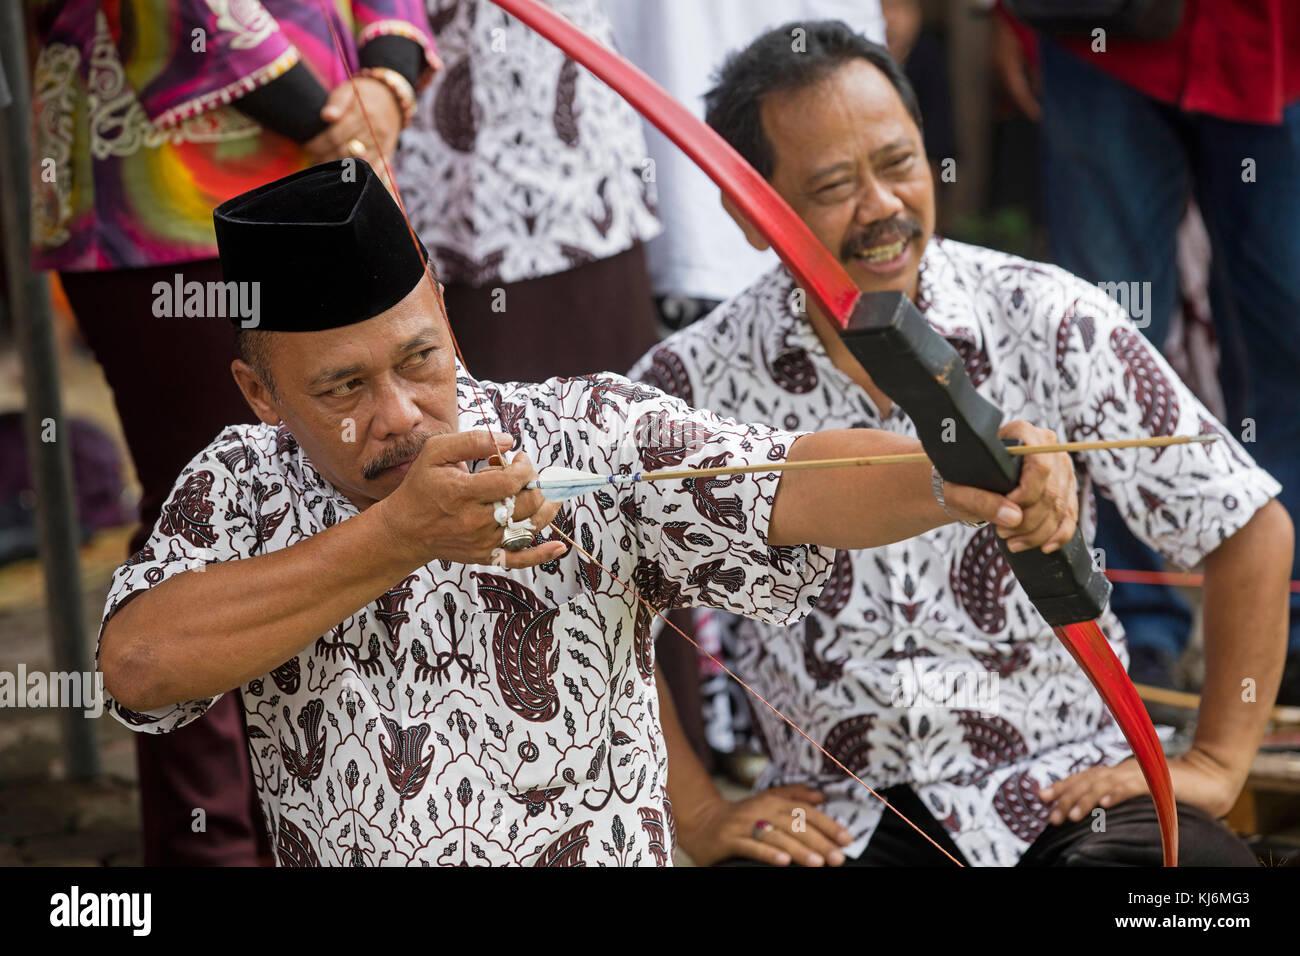 Mayor of the city Yogyakarta practicing Jemparingan / traditional Javanese archery by shooting bow and arrows, Java, - Stock Image